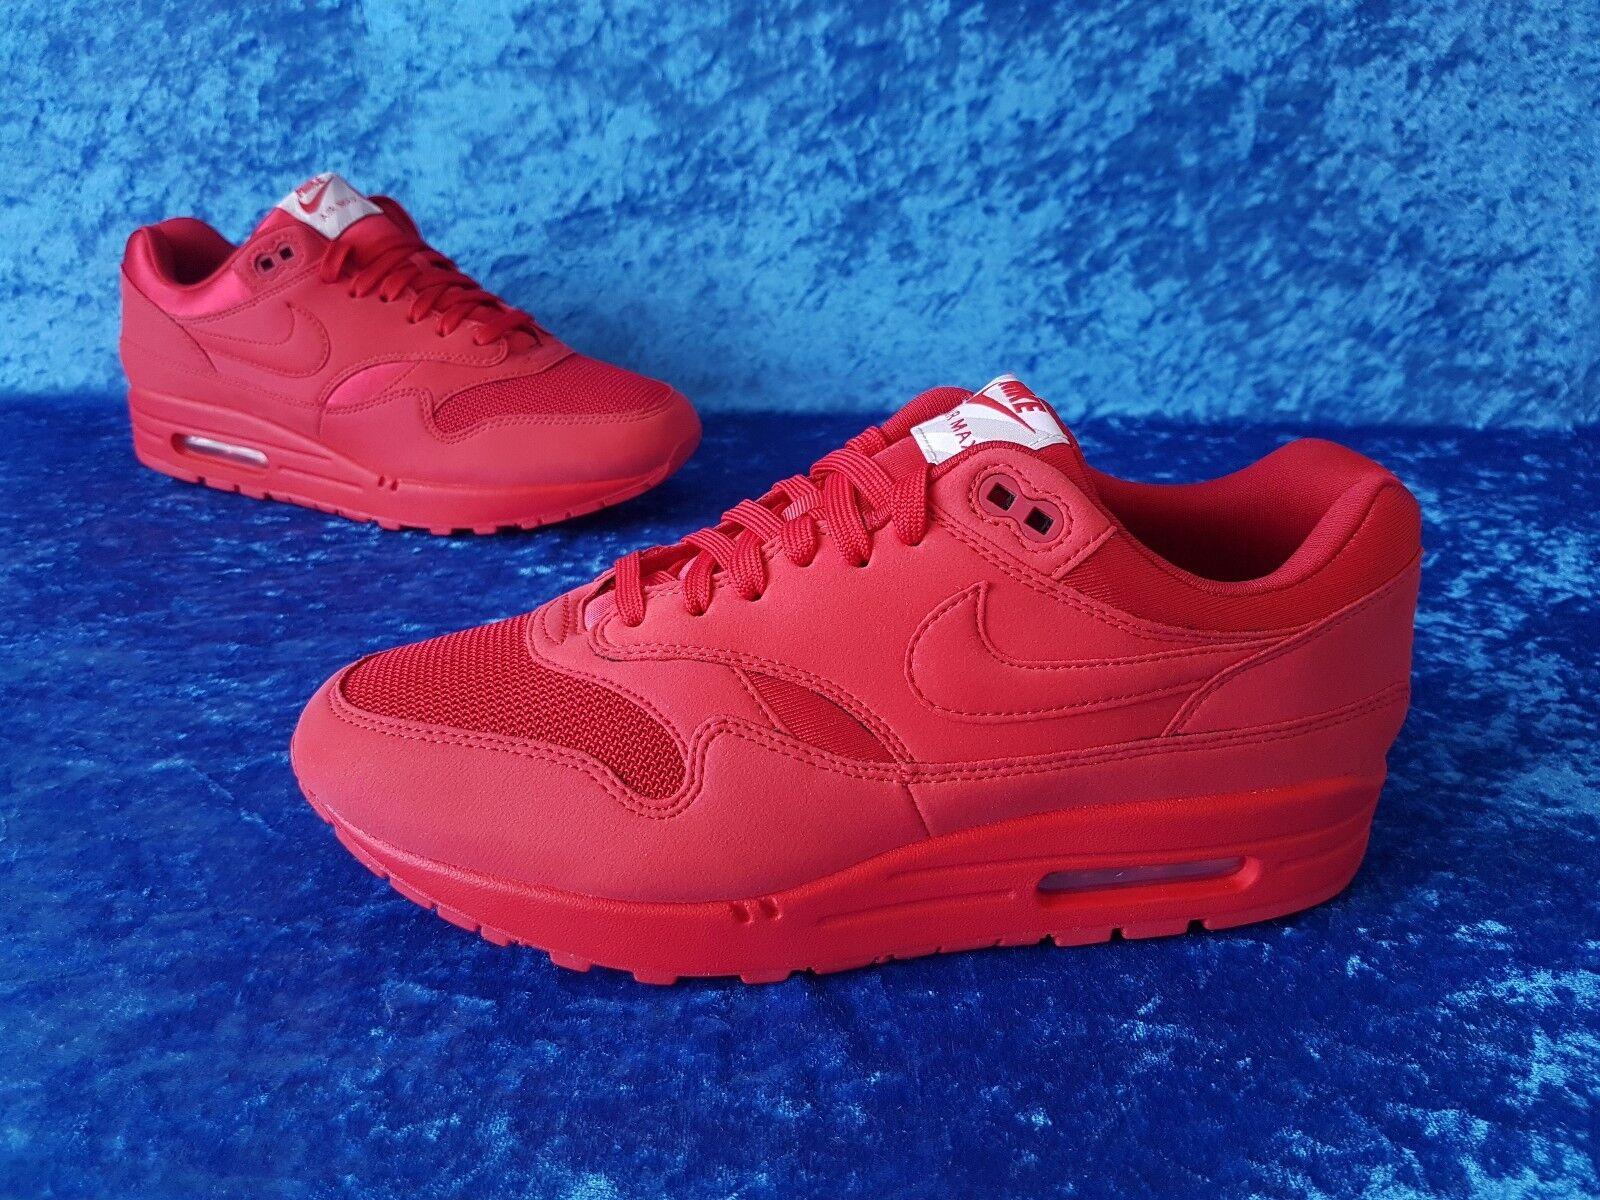 Nike Air Max 1 Tonal Red / 42 / 8.5 us / 7.5 uk / box logo